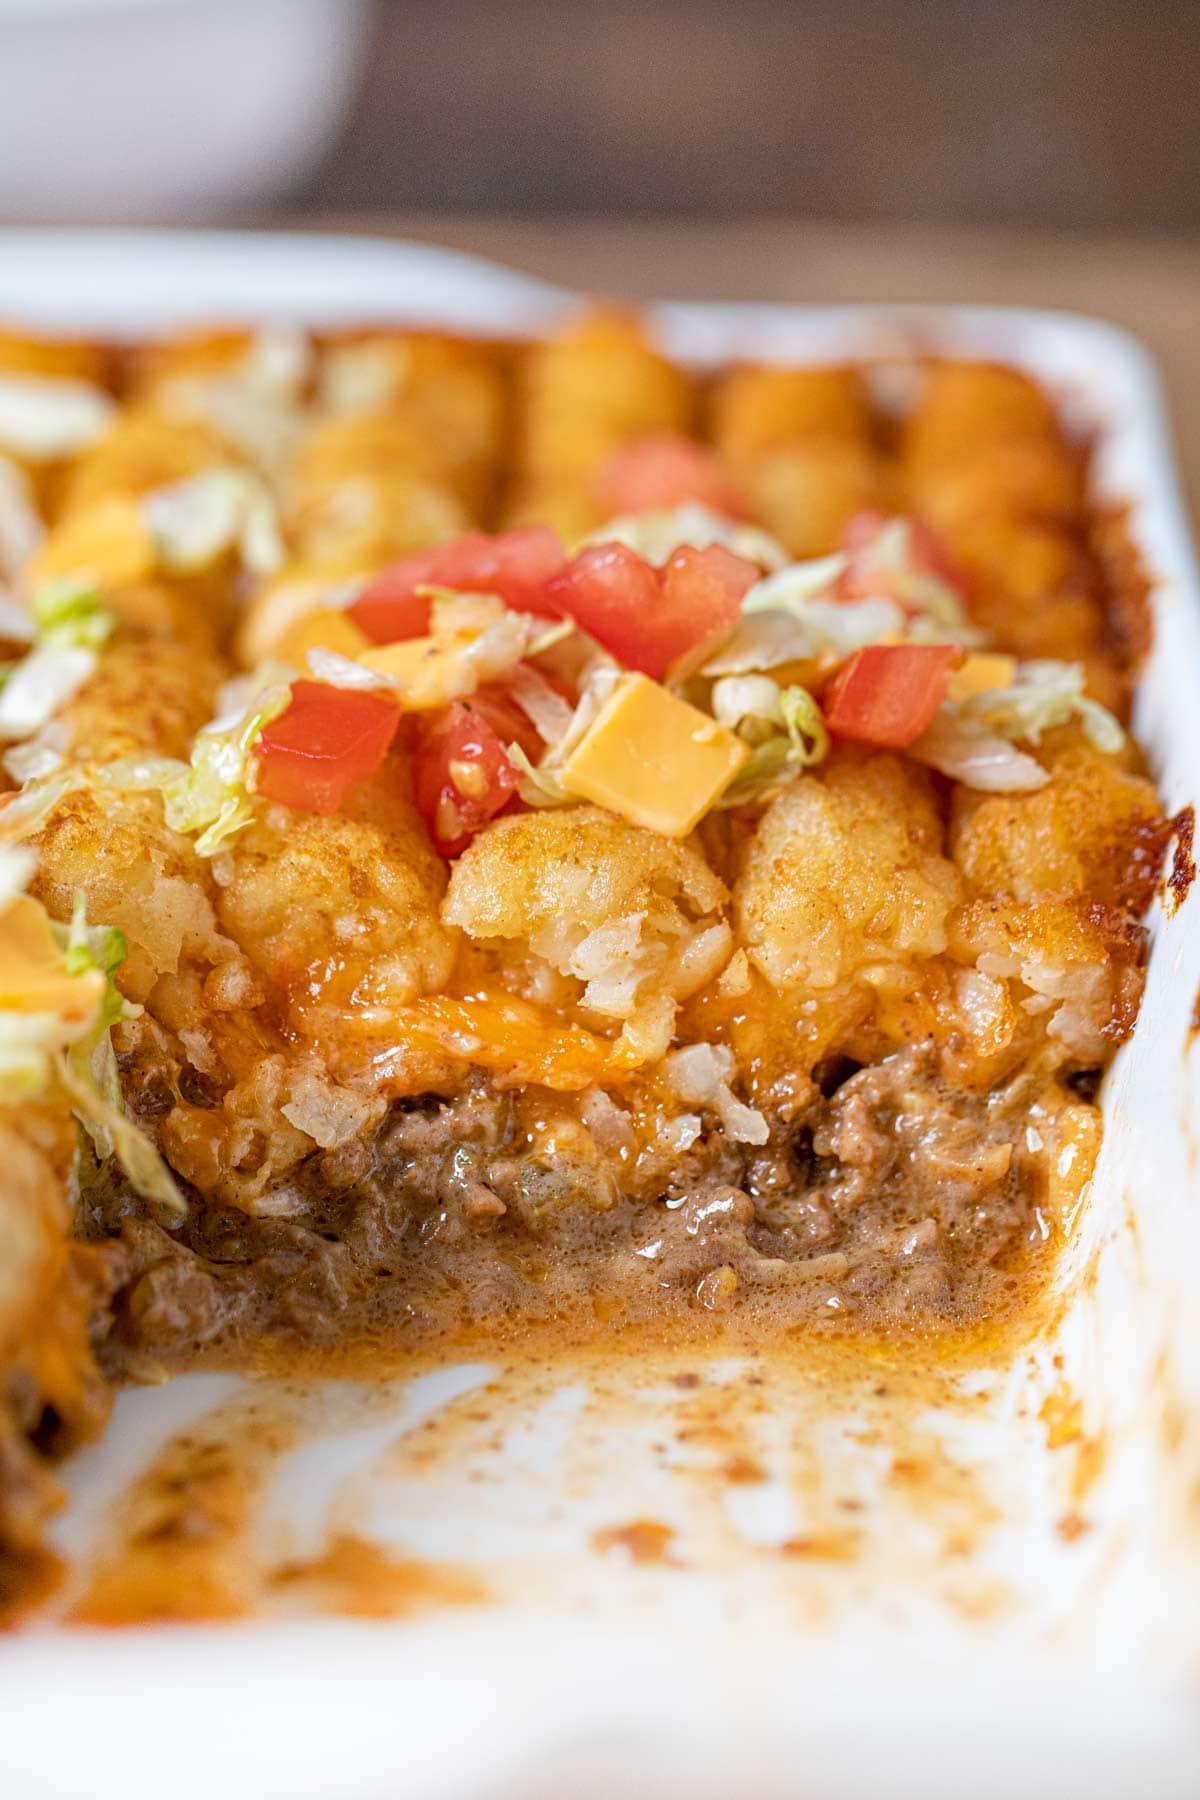 Big Mac Tater Tot Casserole in baking dish